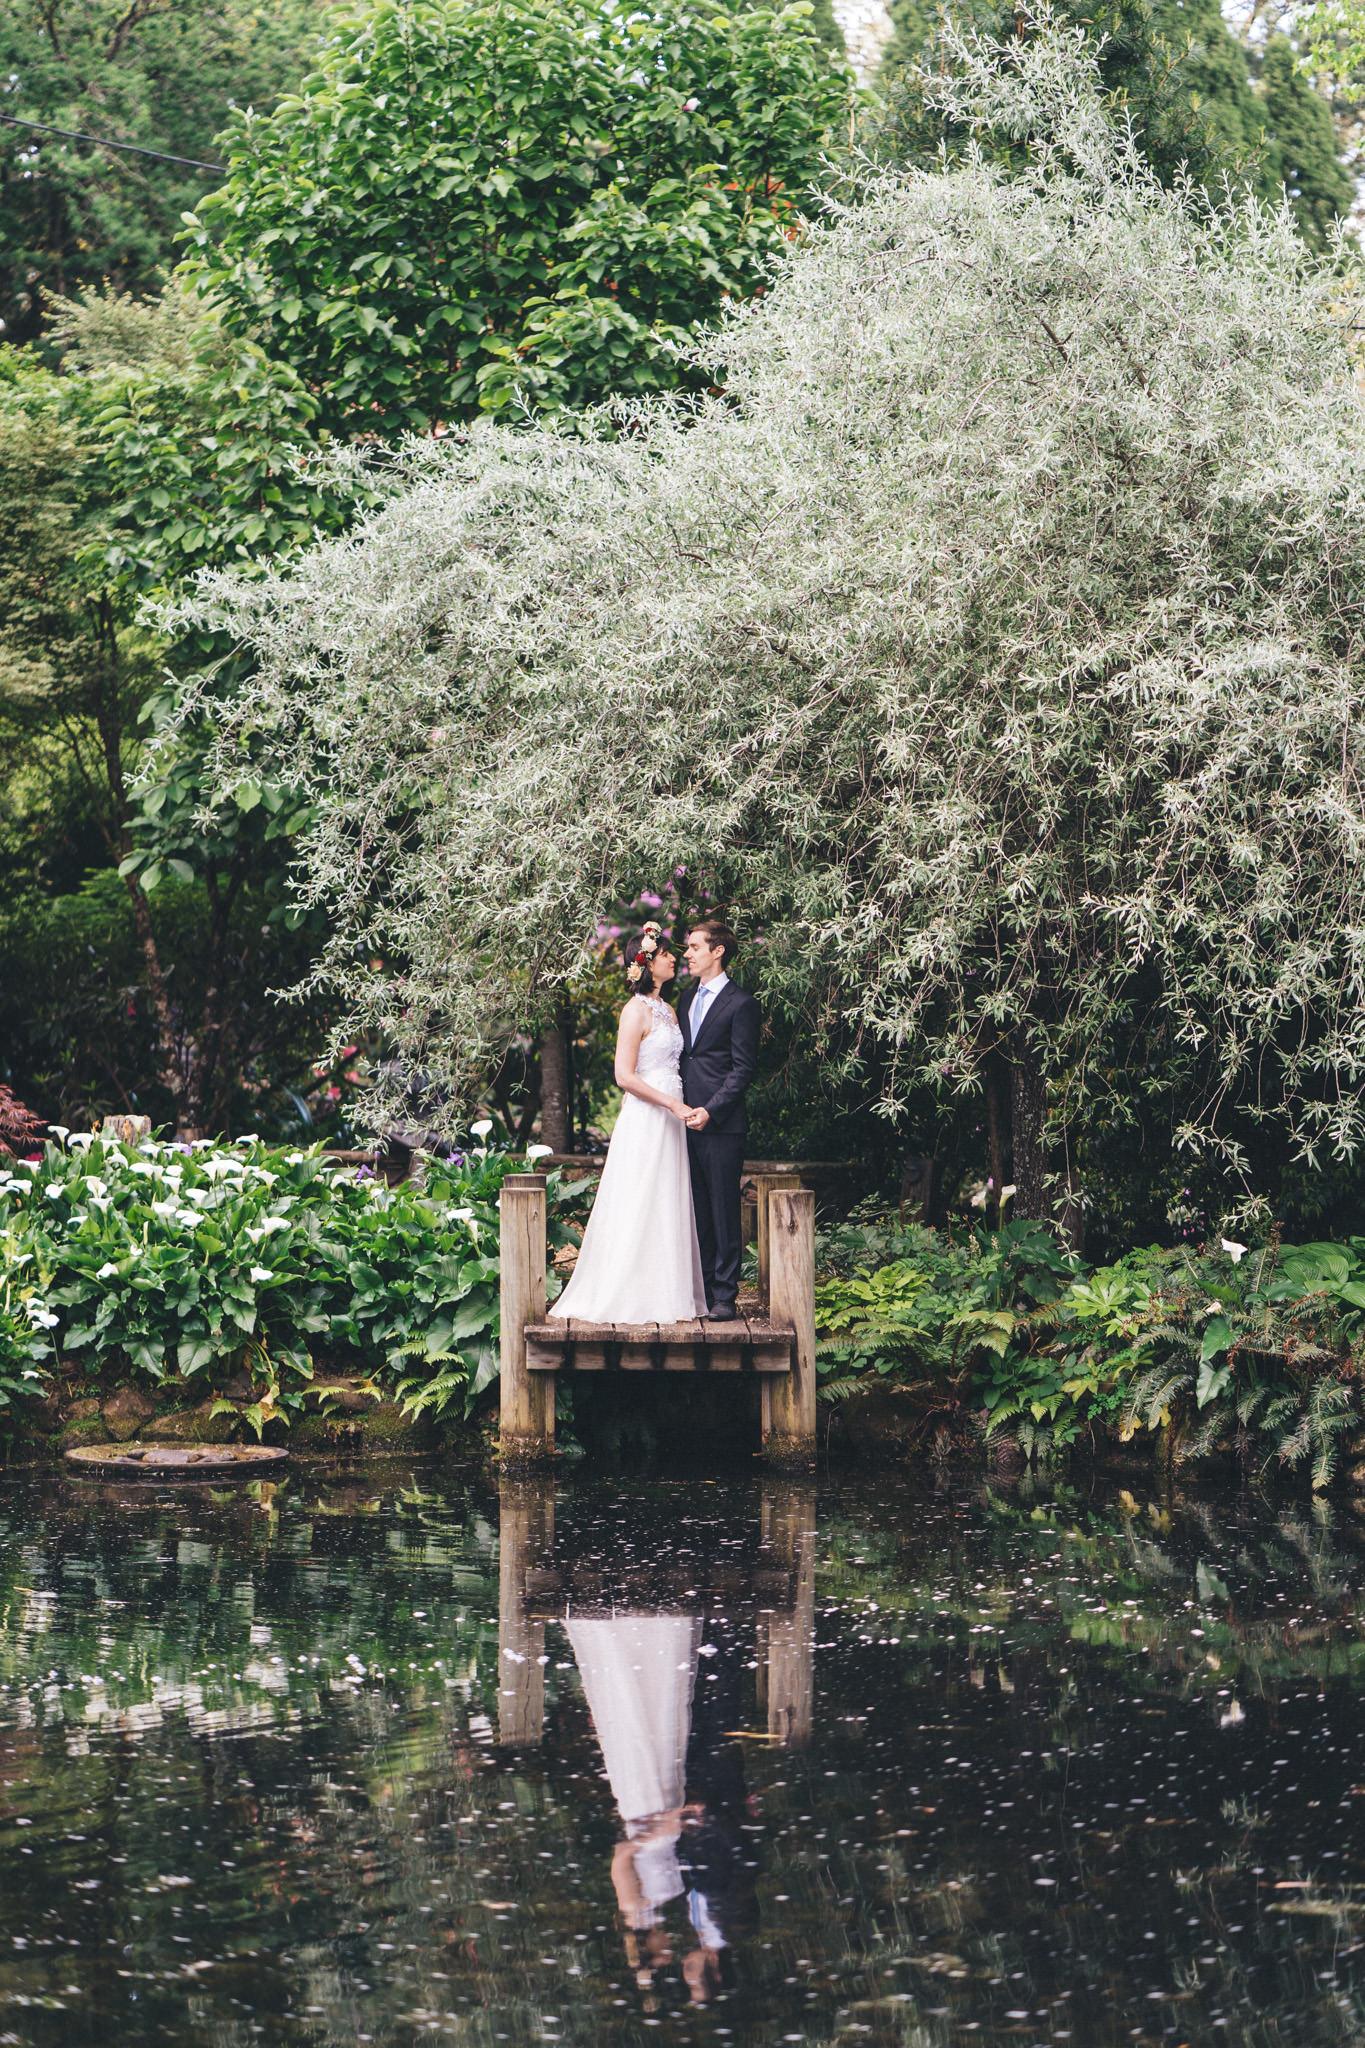 Ann-Marie-Yuen-Photography0002.jpg